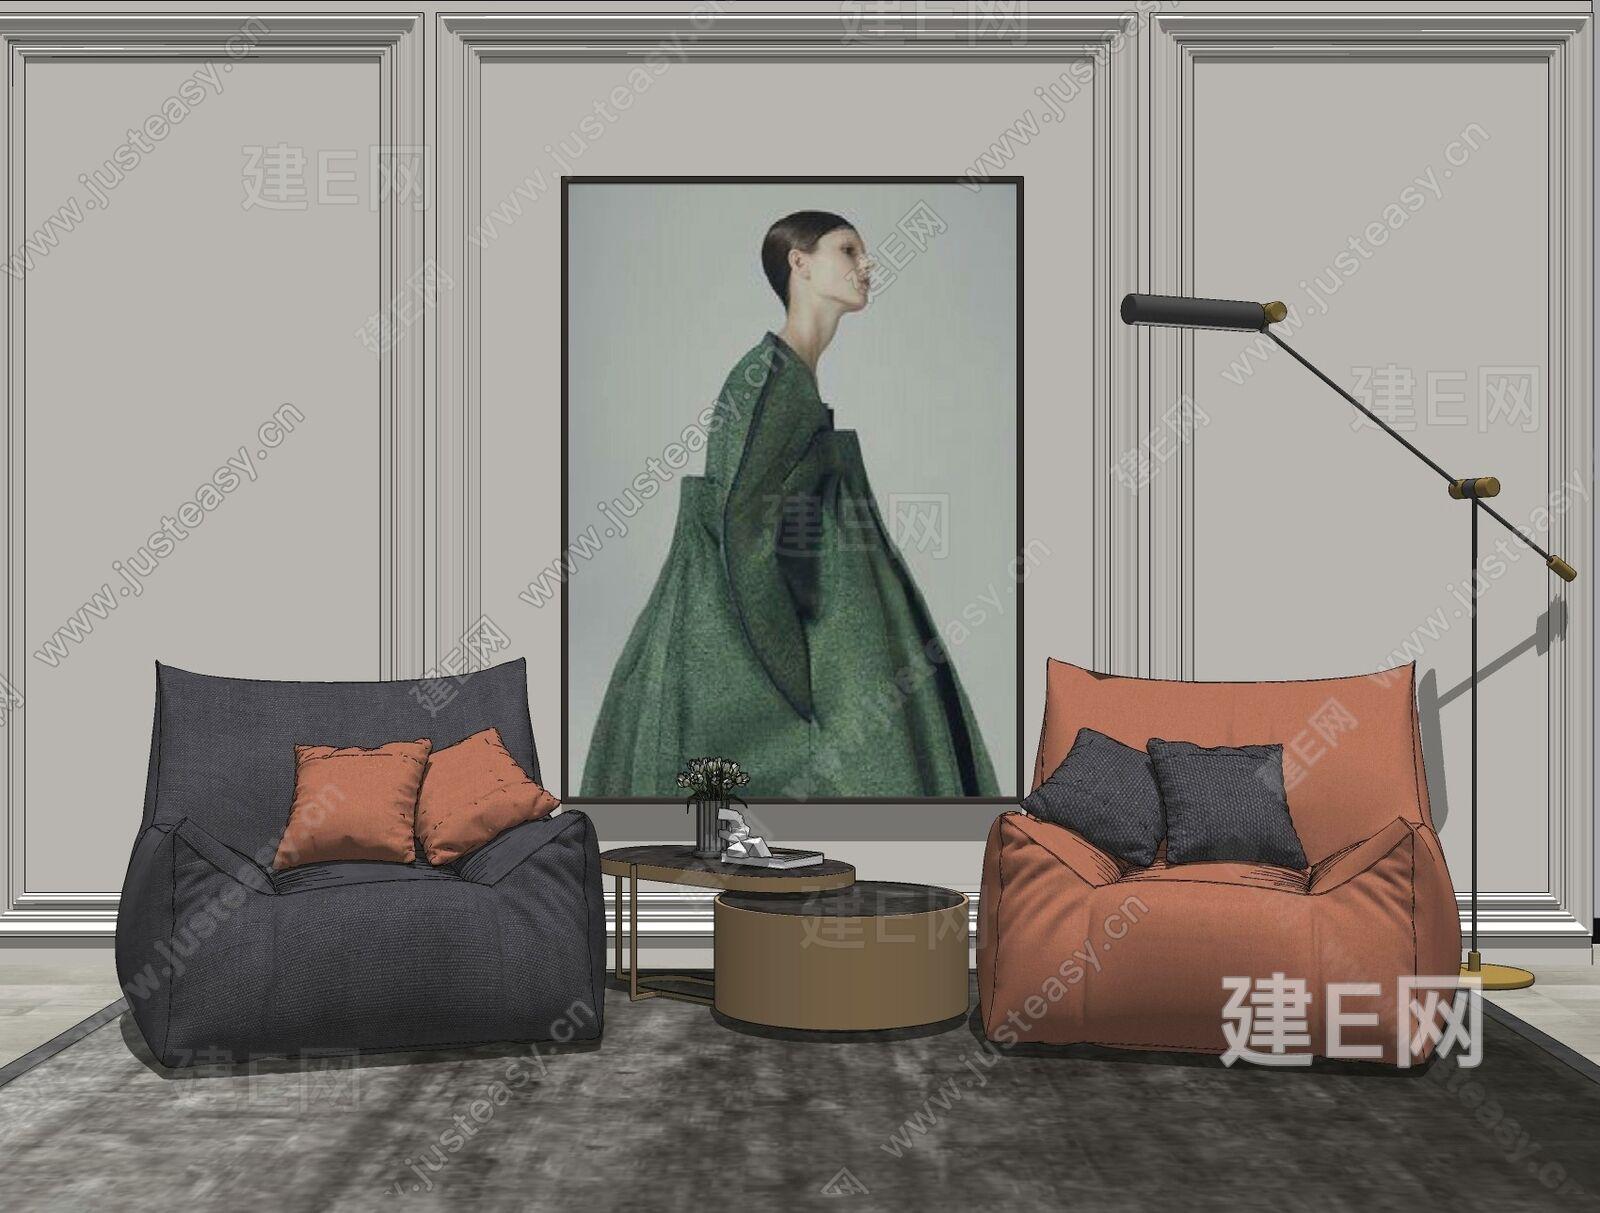 现代懒人沙发边几组合sketchup模型